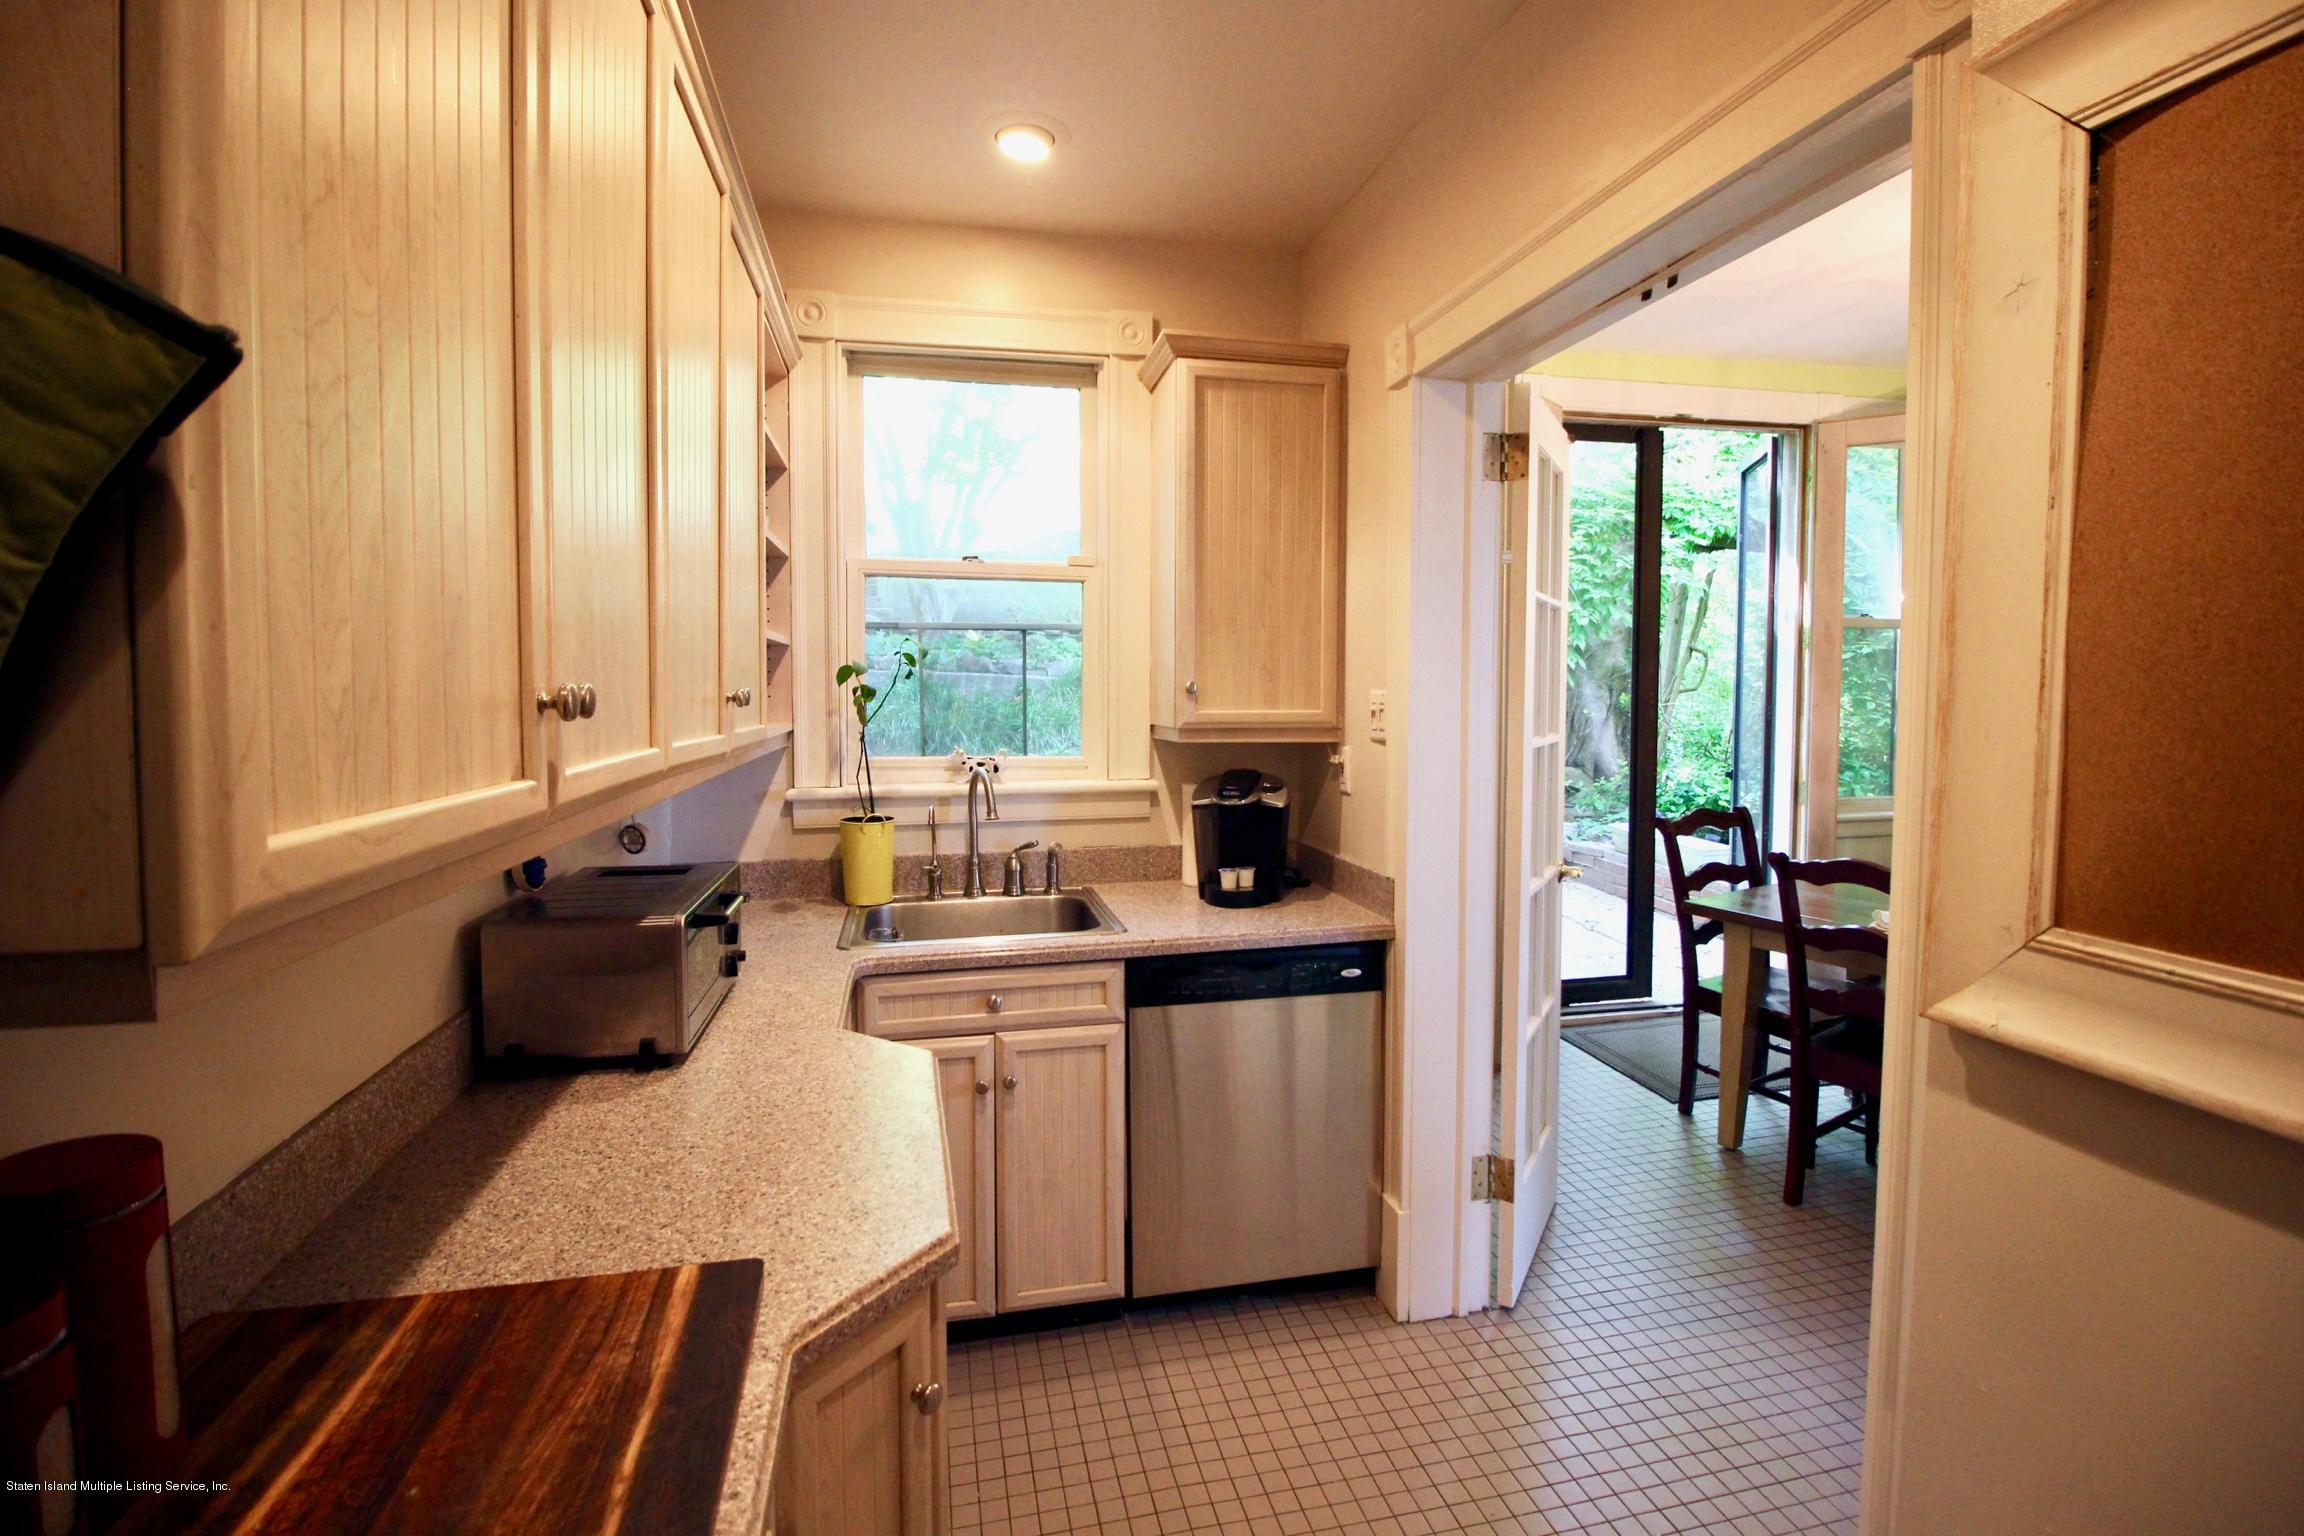 Single Family - Detached 208 St Pauls Avenue  Staten Island, NY 10304, MLS-1129566-20